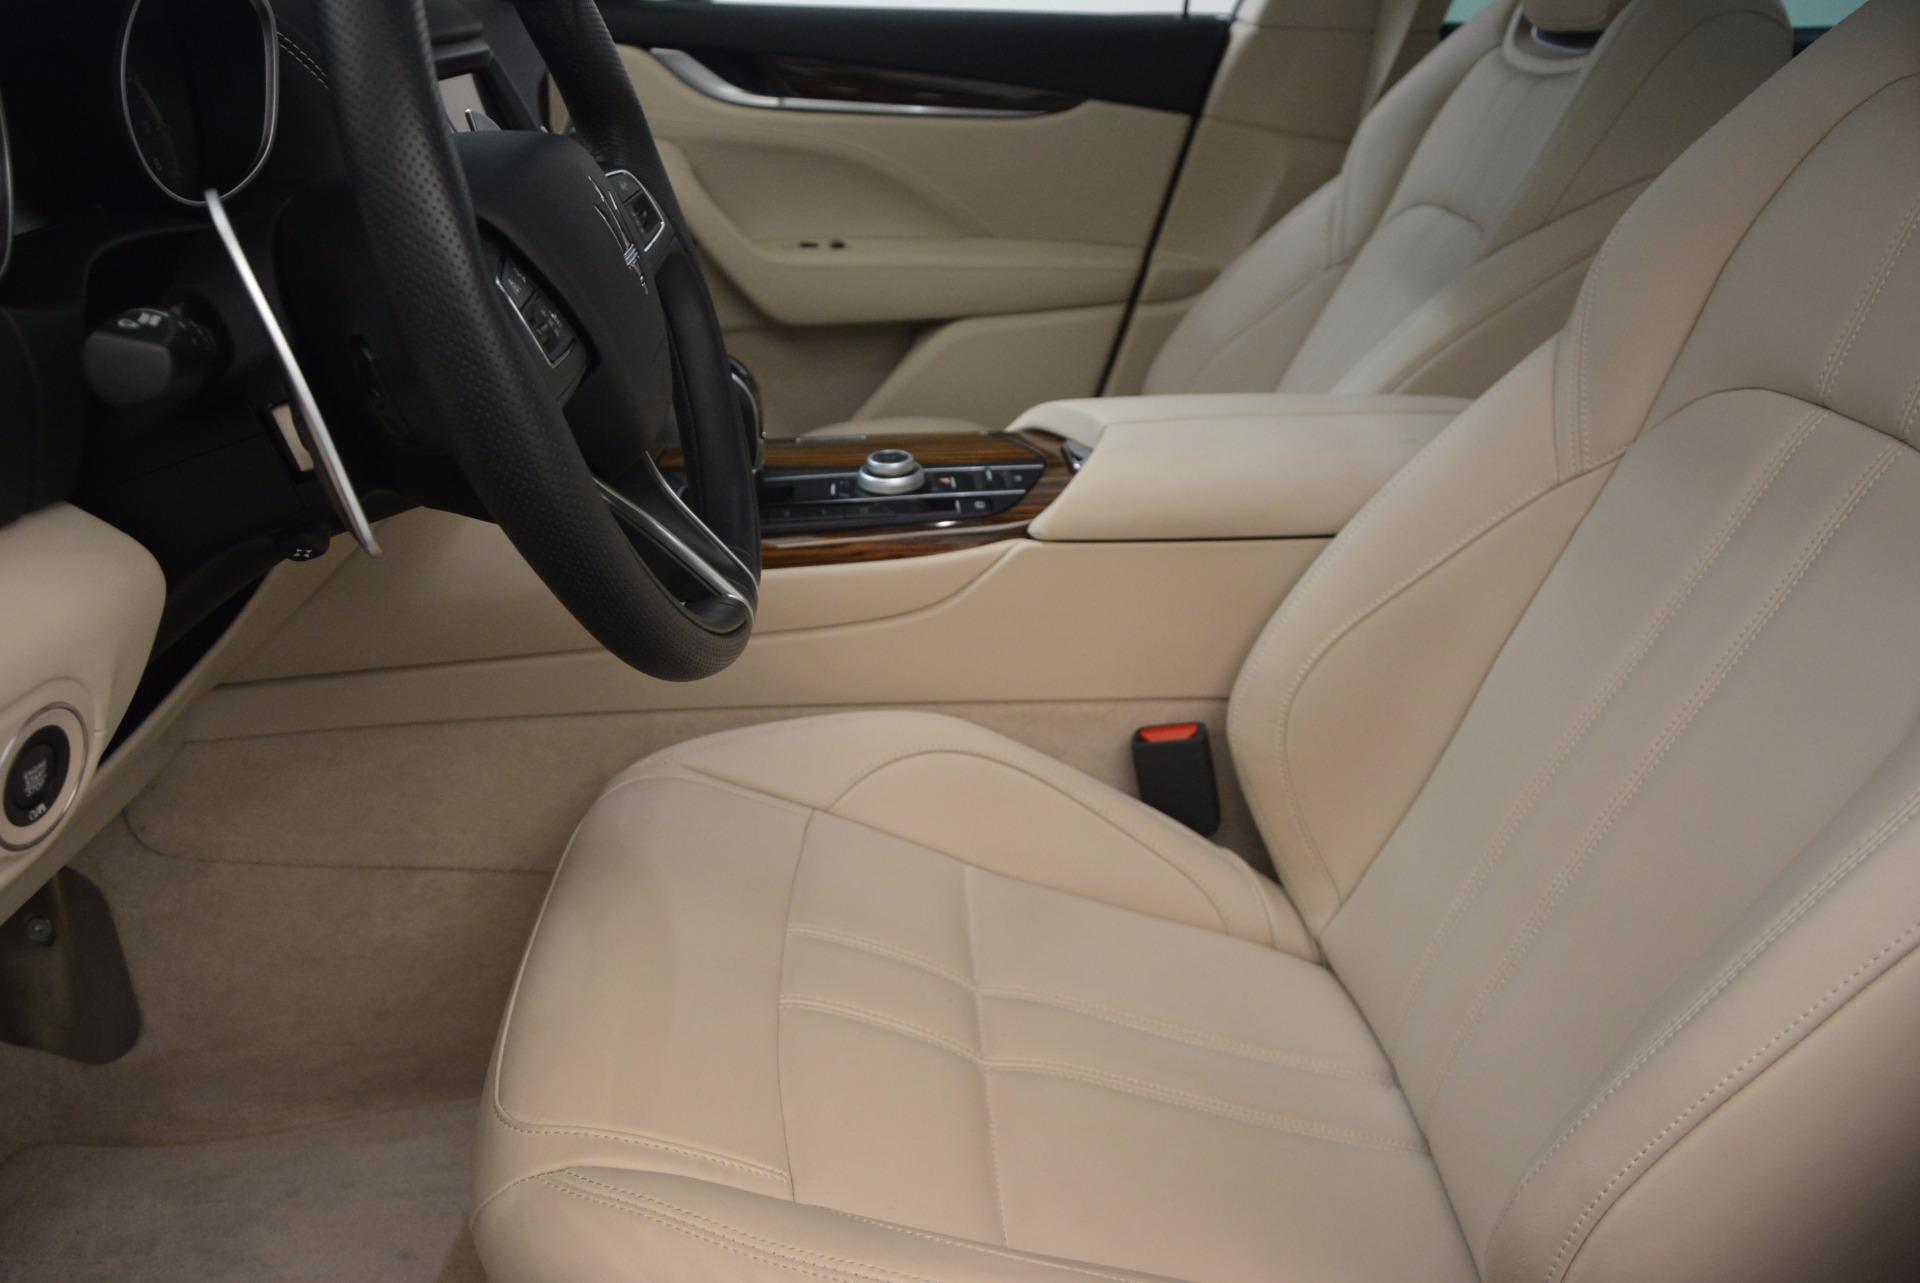 Used 2017 Maserati Levante S For Sale In Westport, CT 1463_p14